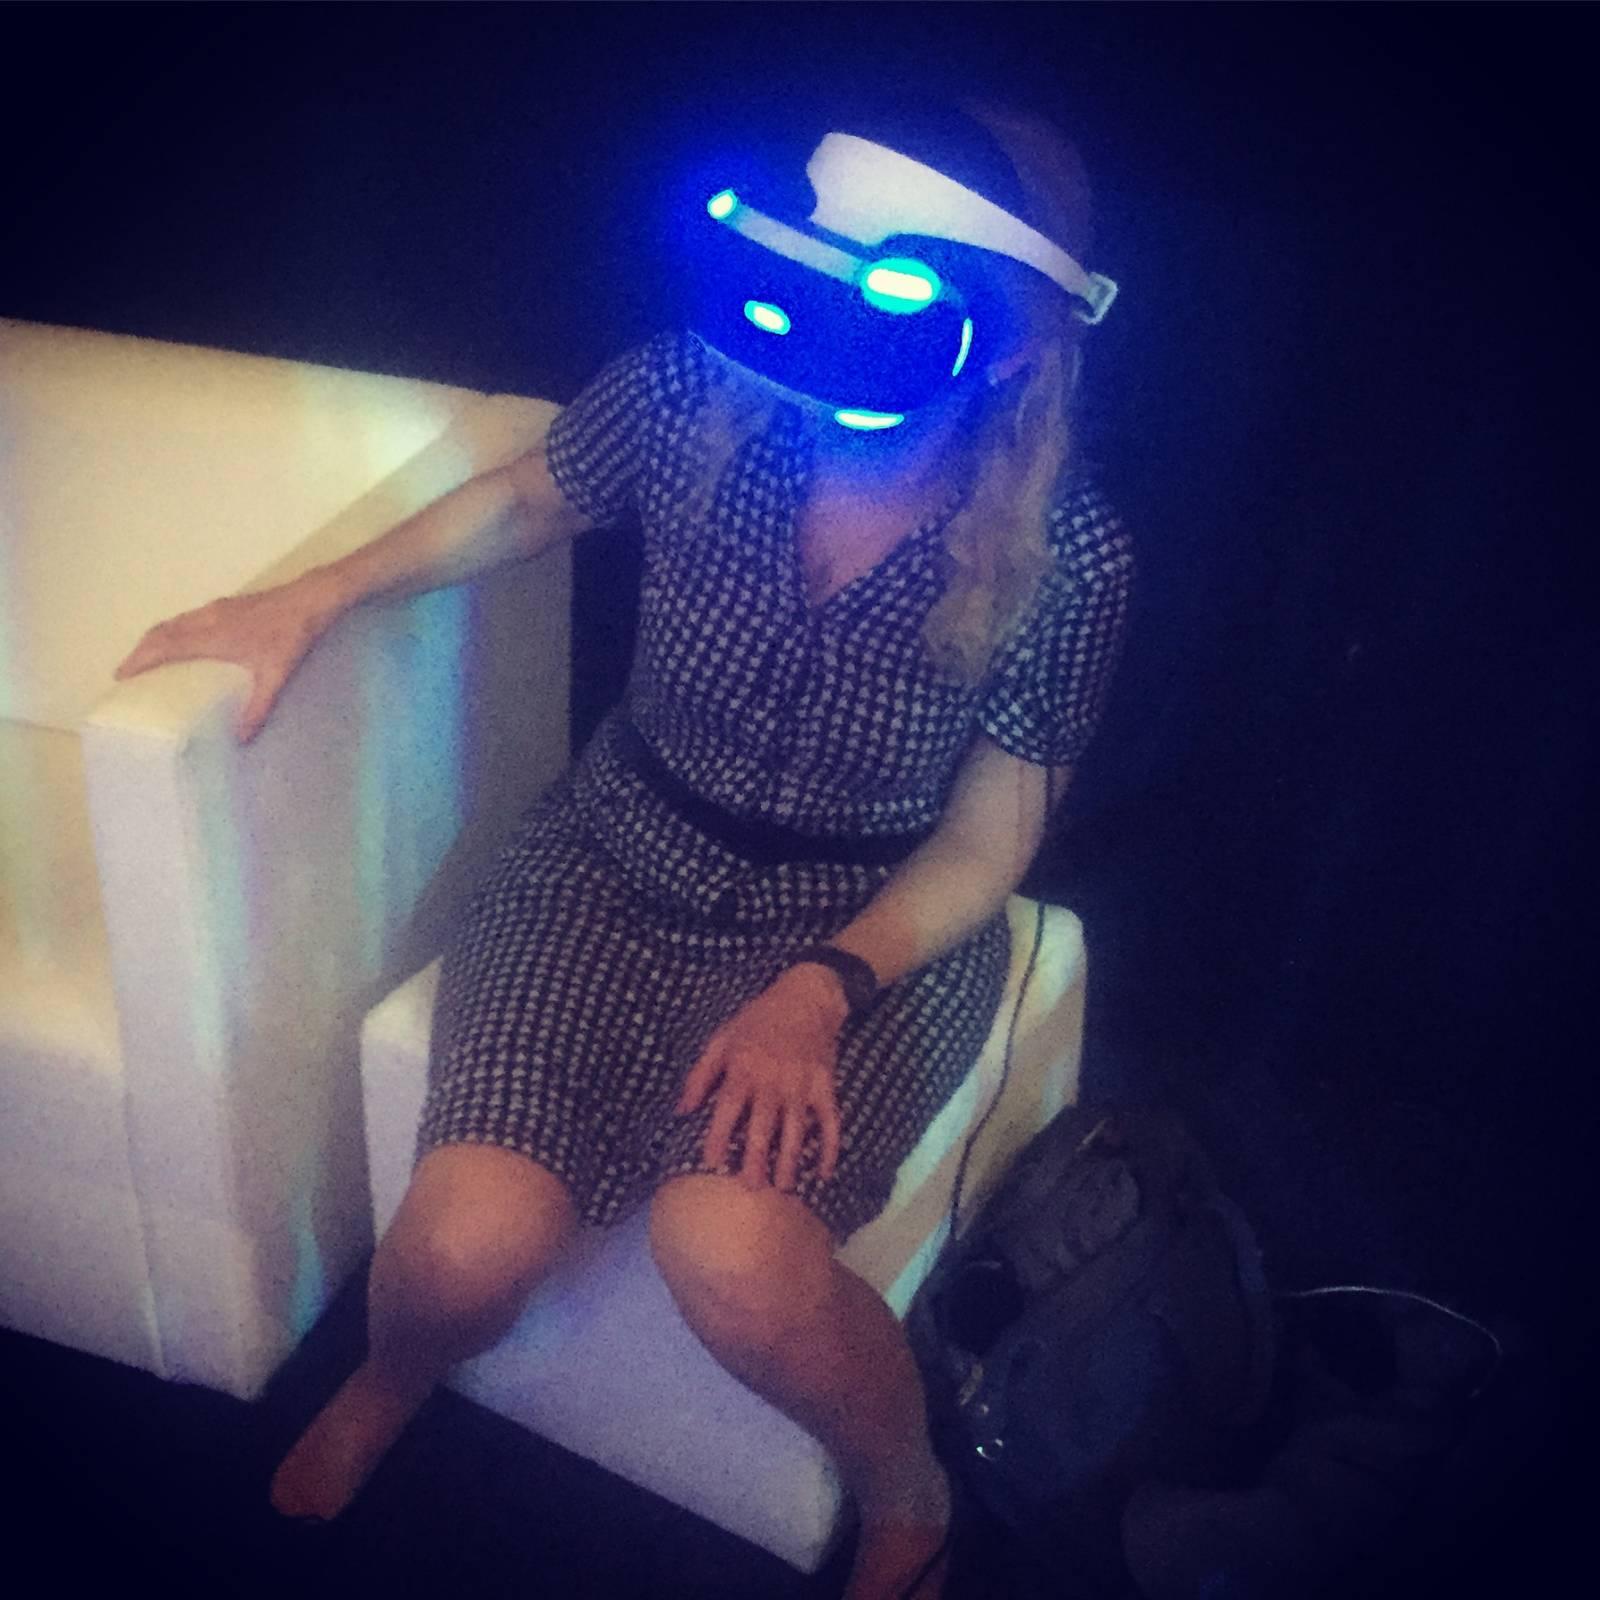 Sony-Morpheus-VR